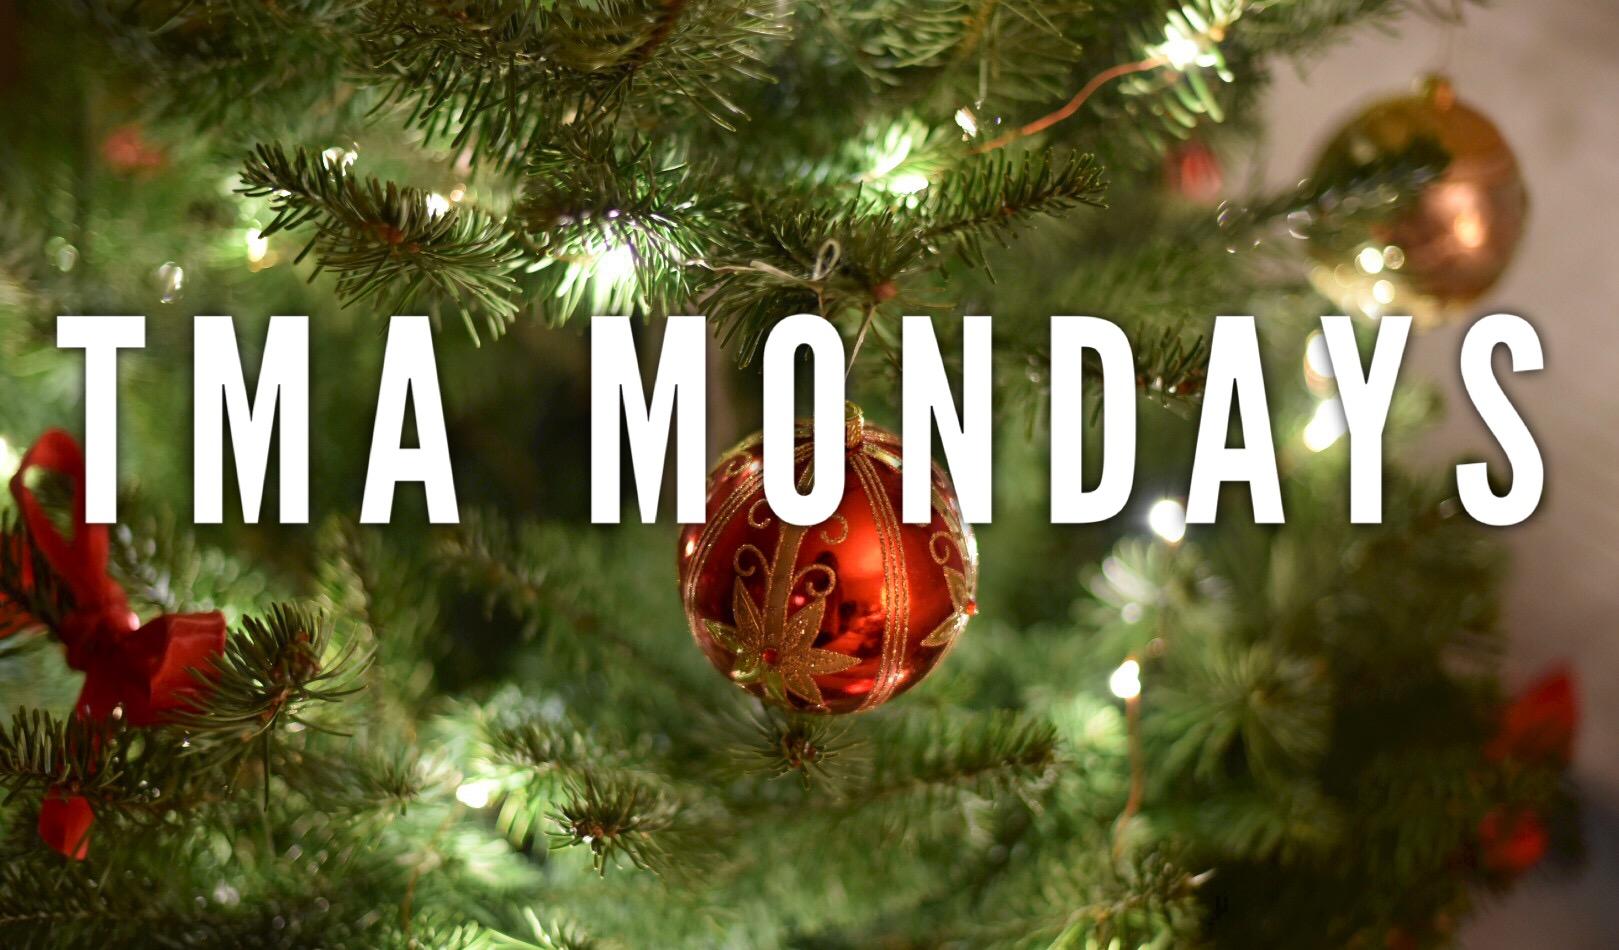 TMA Mondays: Happy Holidays!